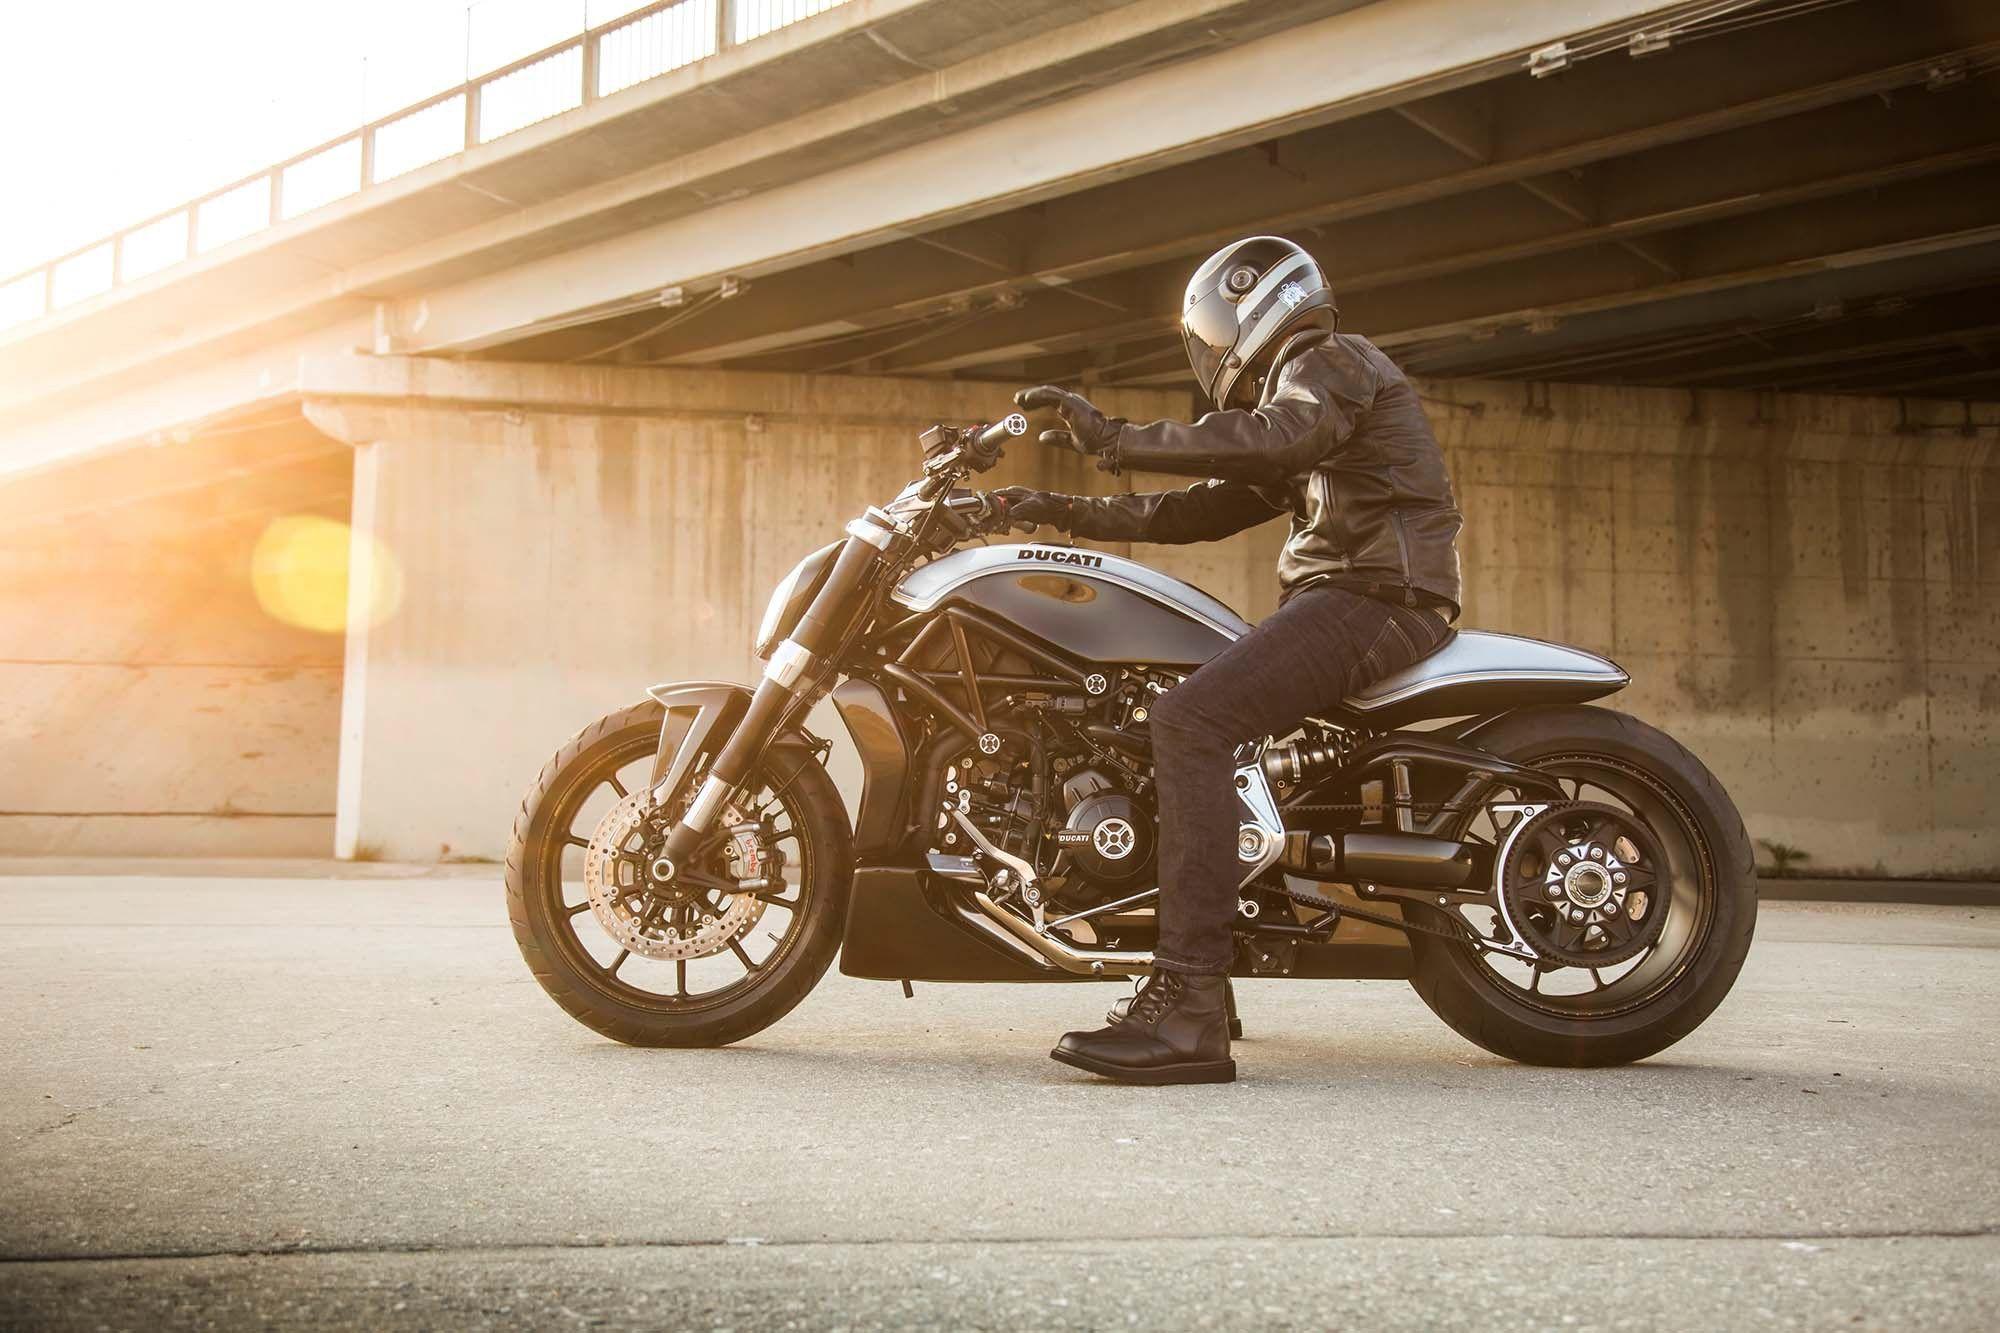 ducati diavelroland design | motorcycles | pinterest | ducati